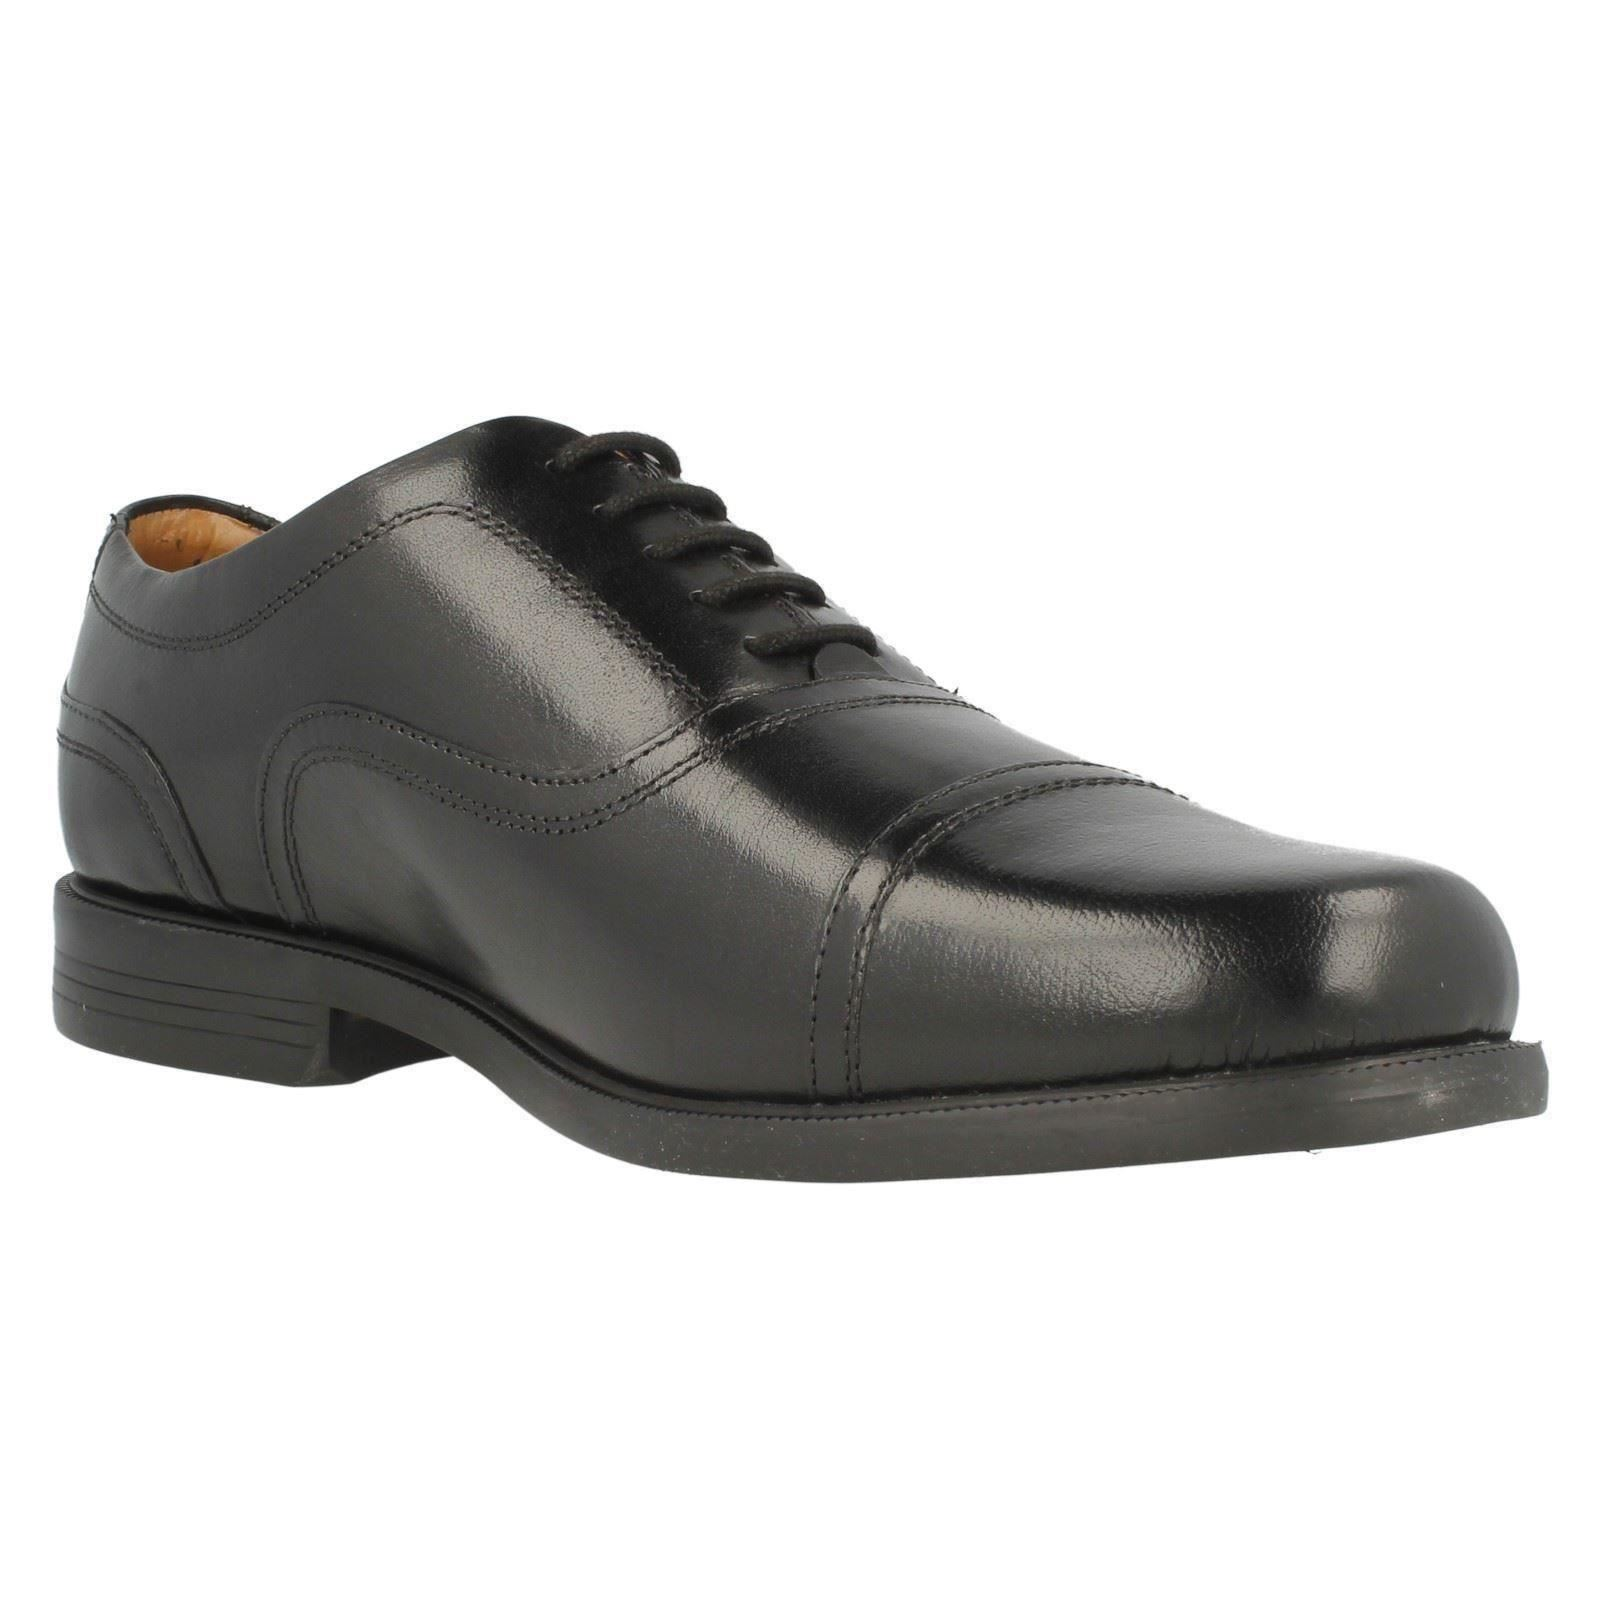 Beeston Shoe Shop